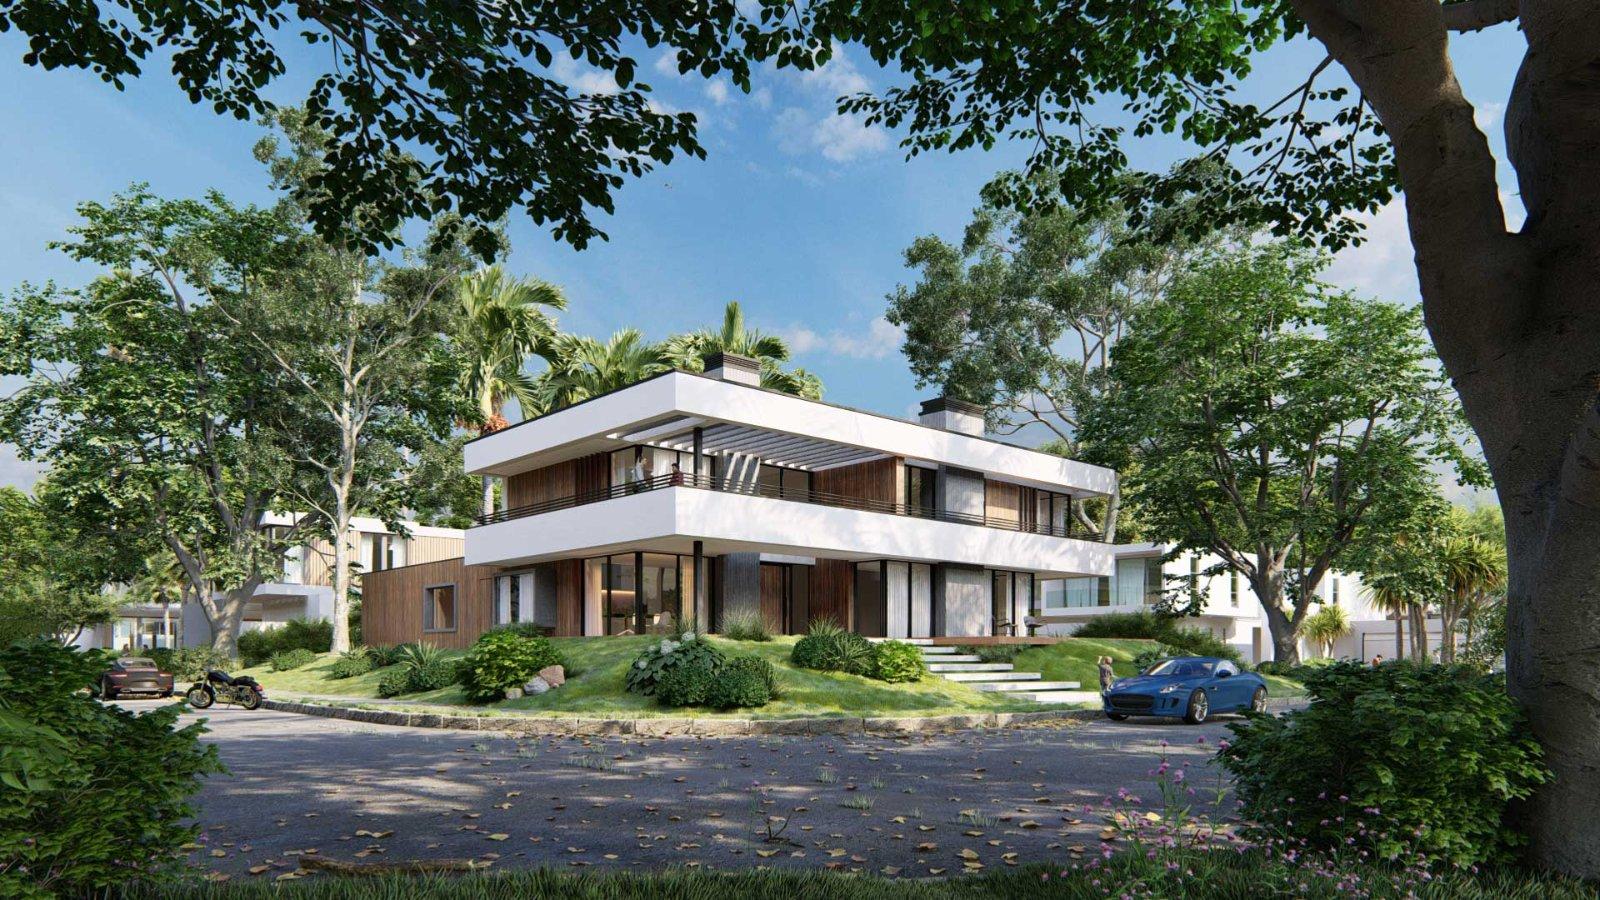 Residential-Exterior-Van-Manen-02-1920x1080_Lumion10.jpg